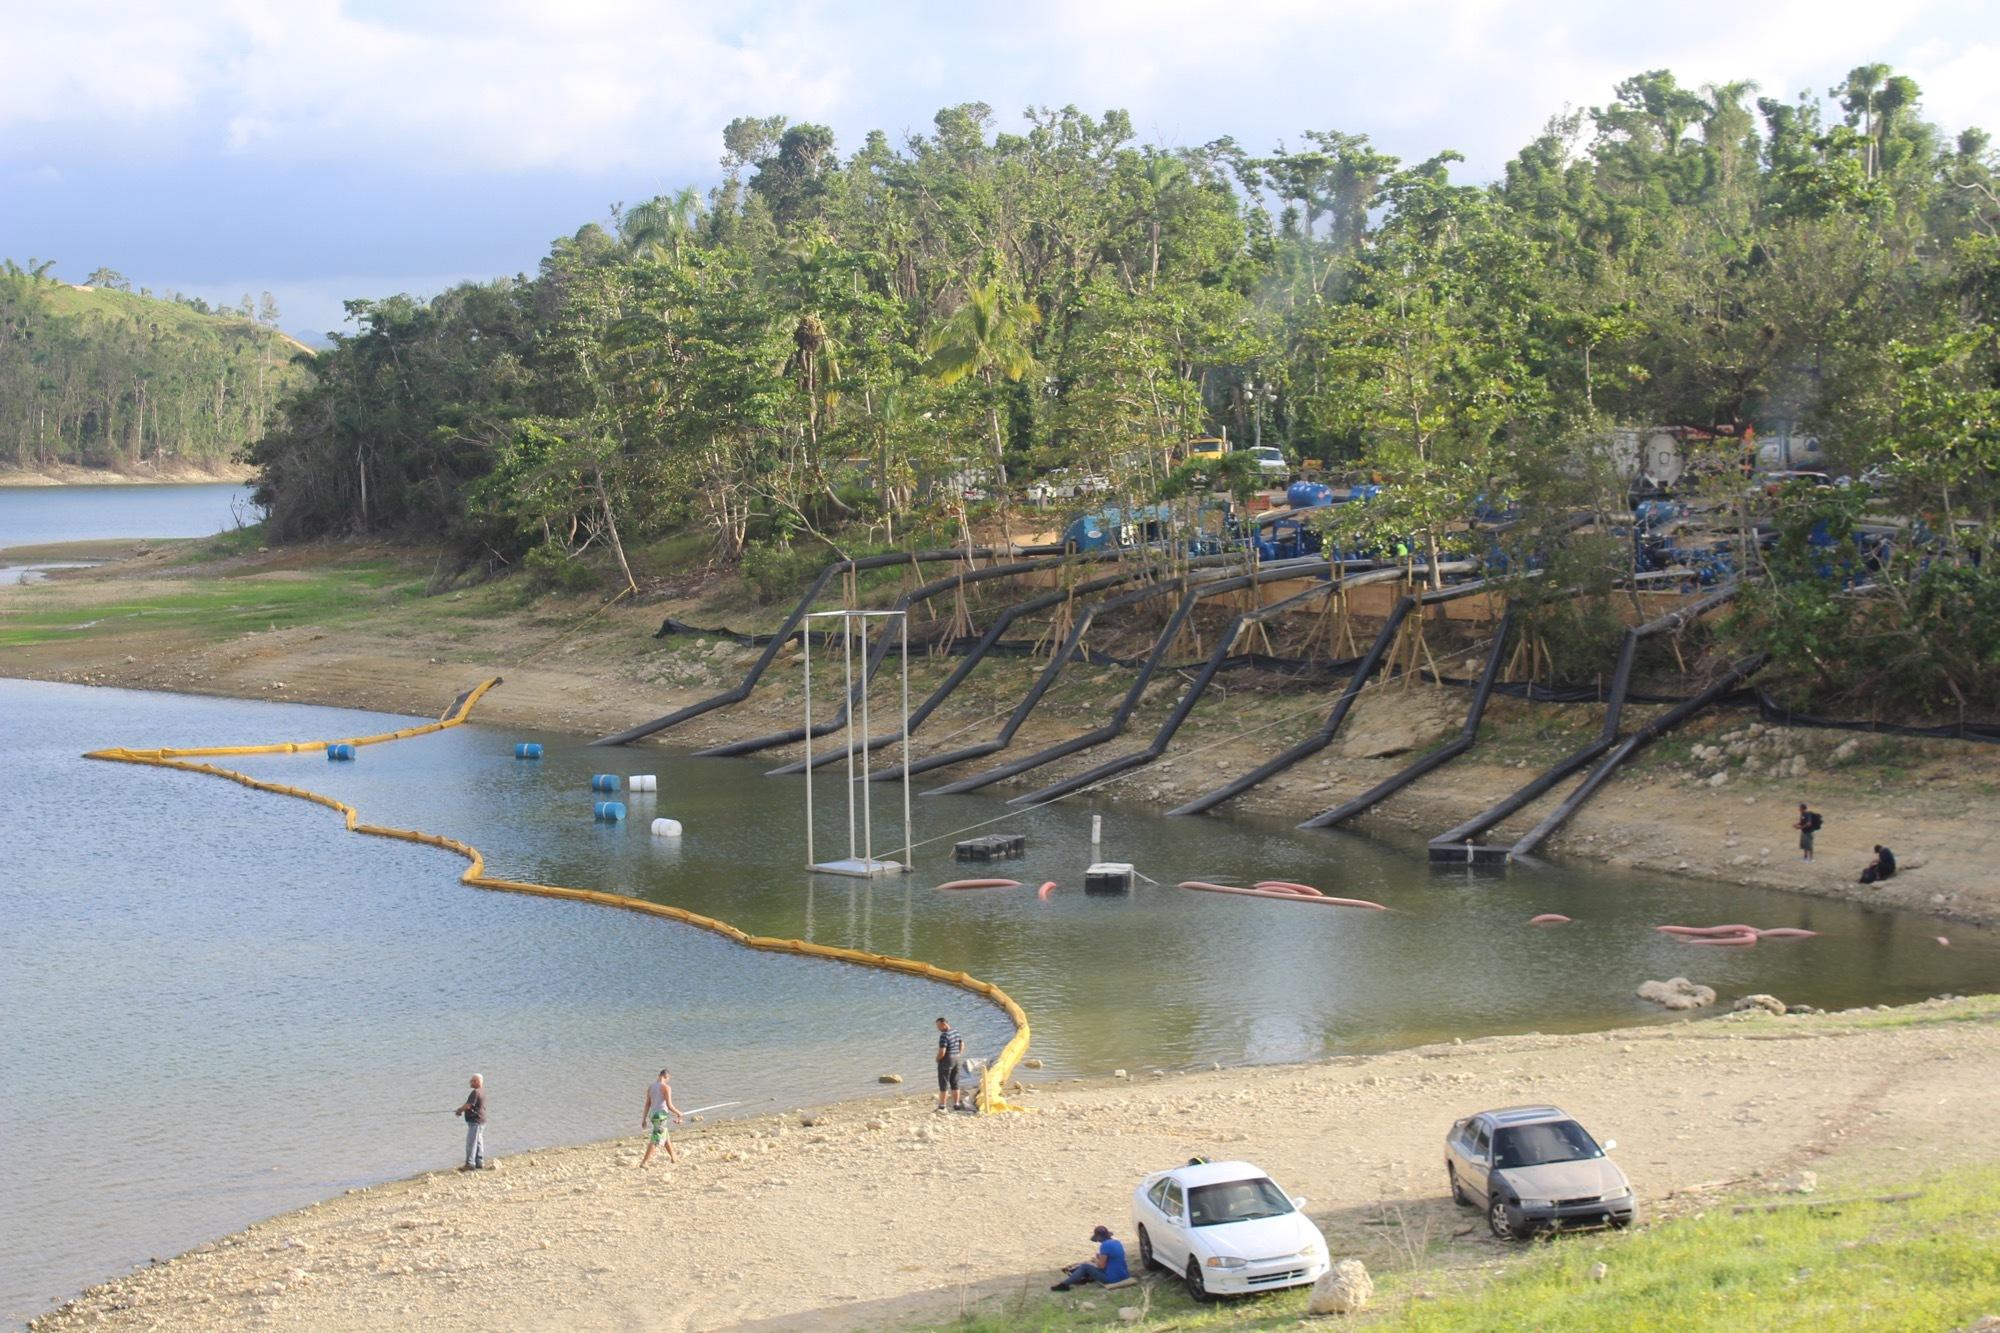 Draining Lake Guatajaca